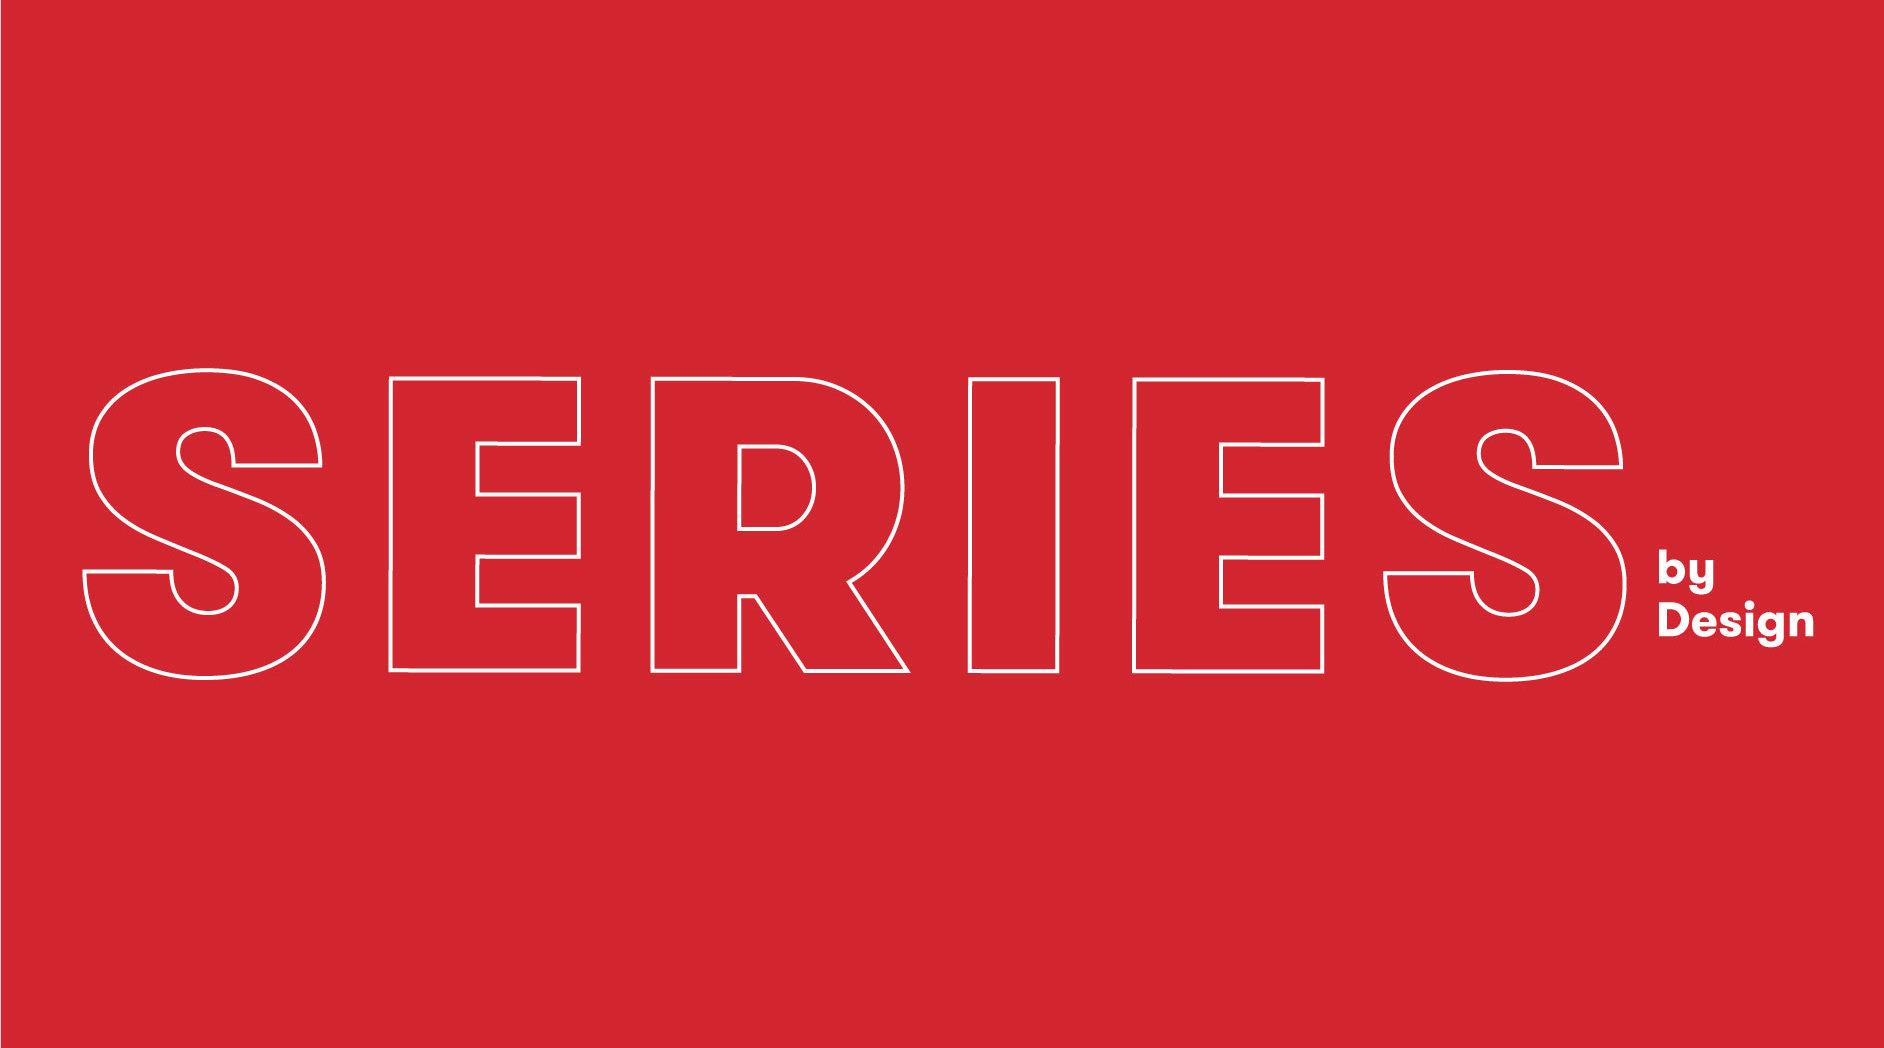 Series by Design logo